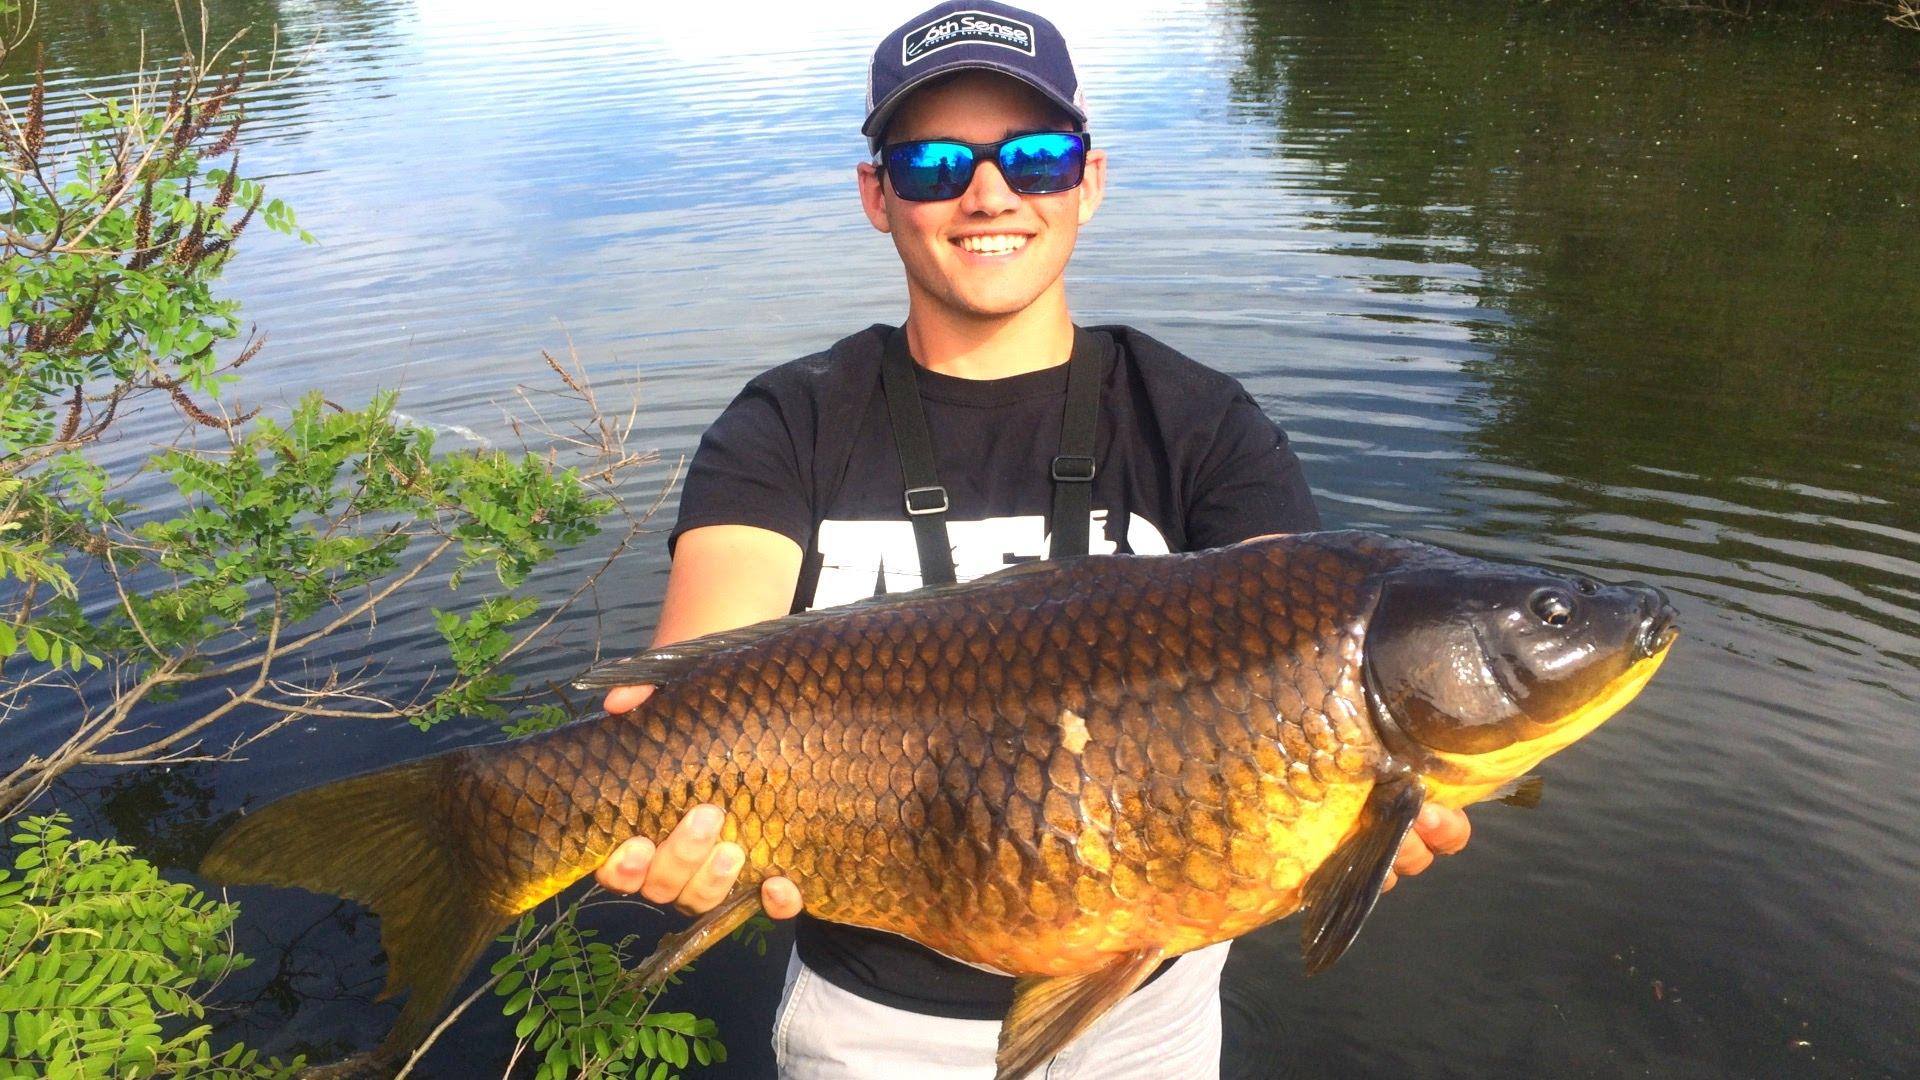 Flair - Fly Fishing for GIANT Carp! - VLOG